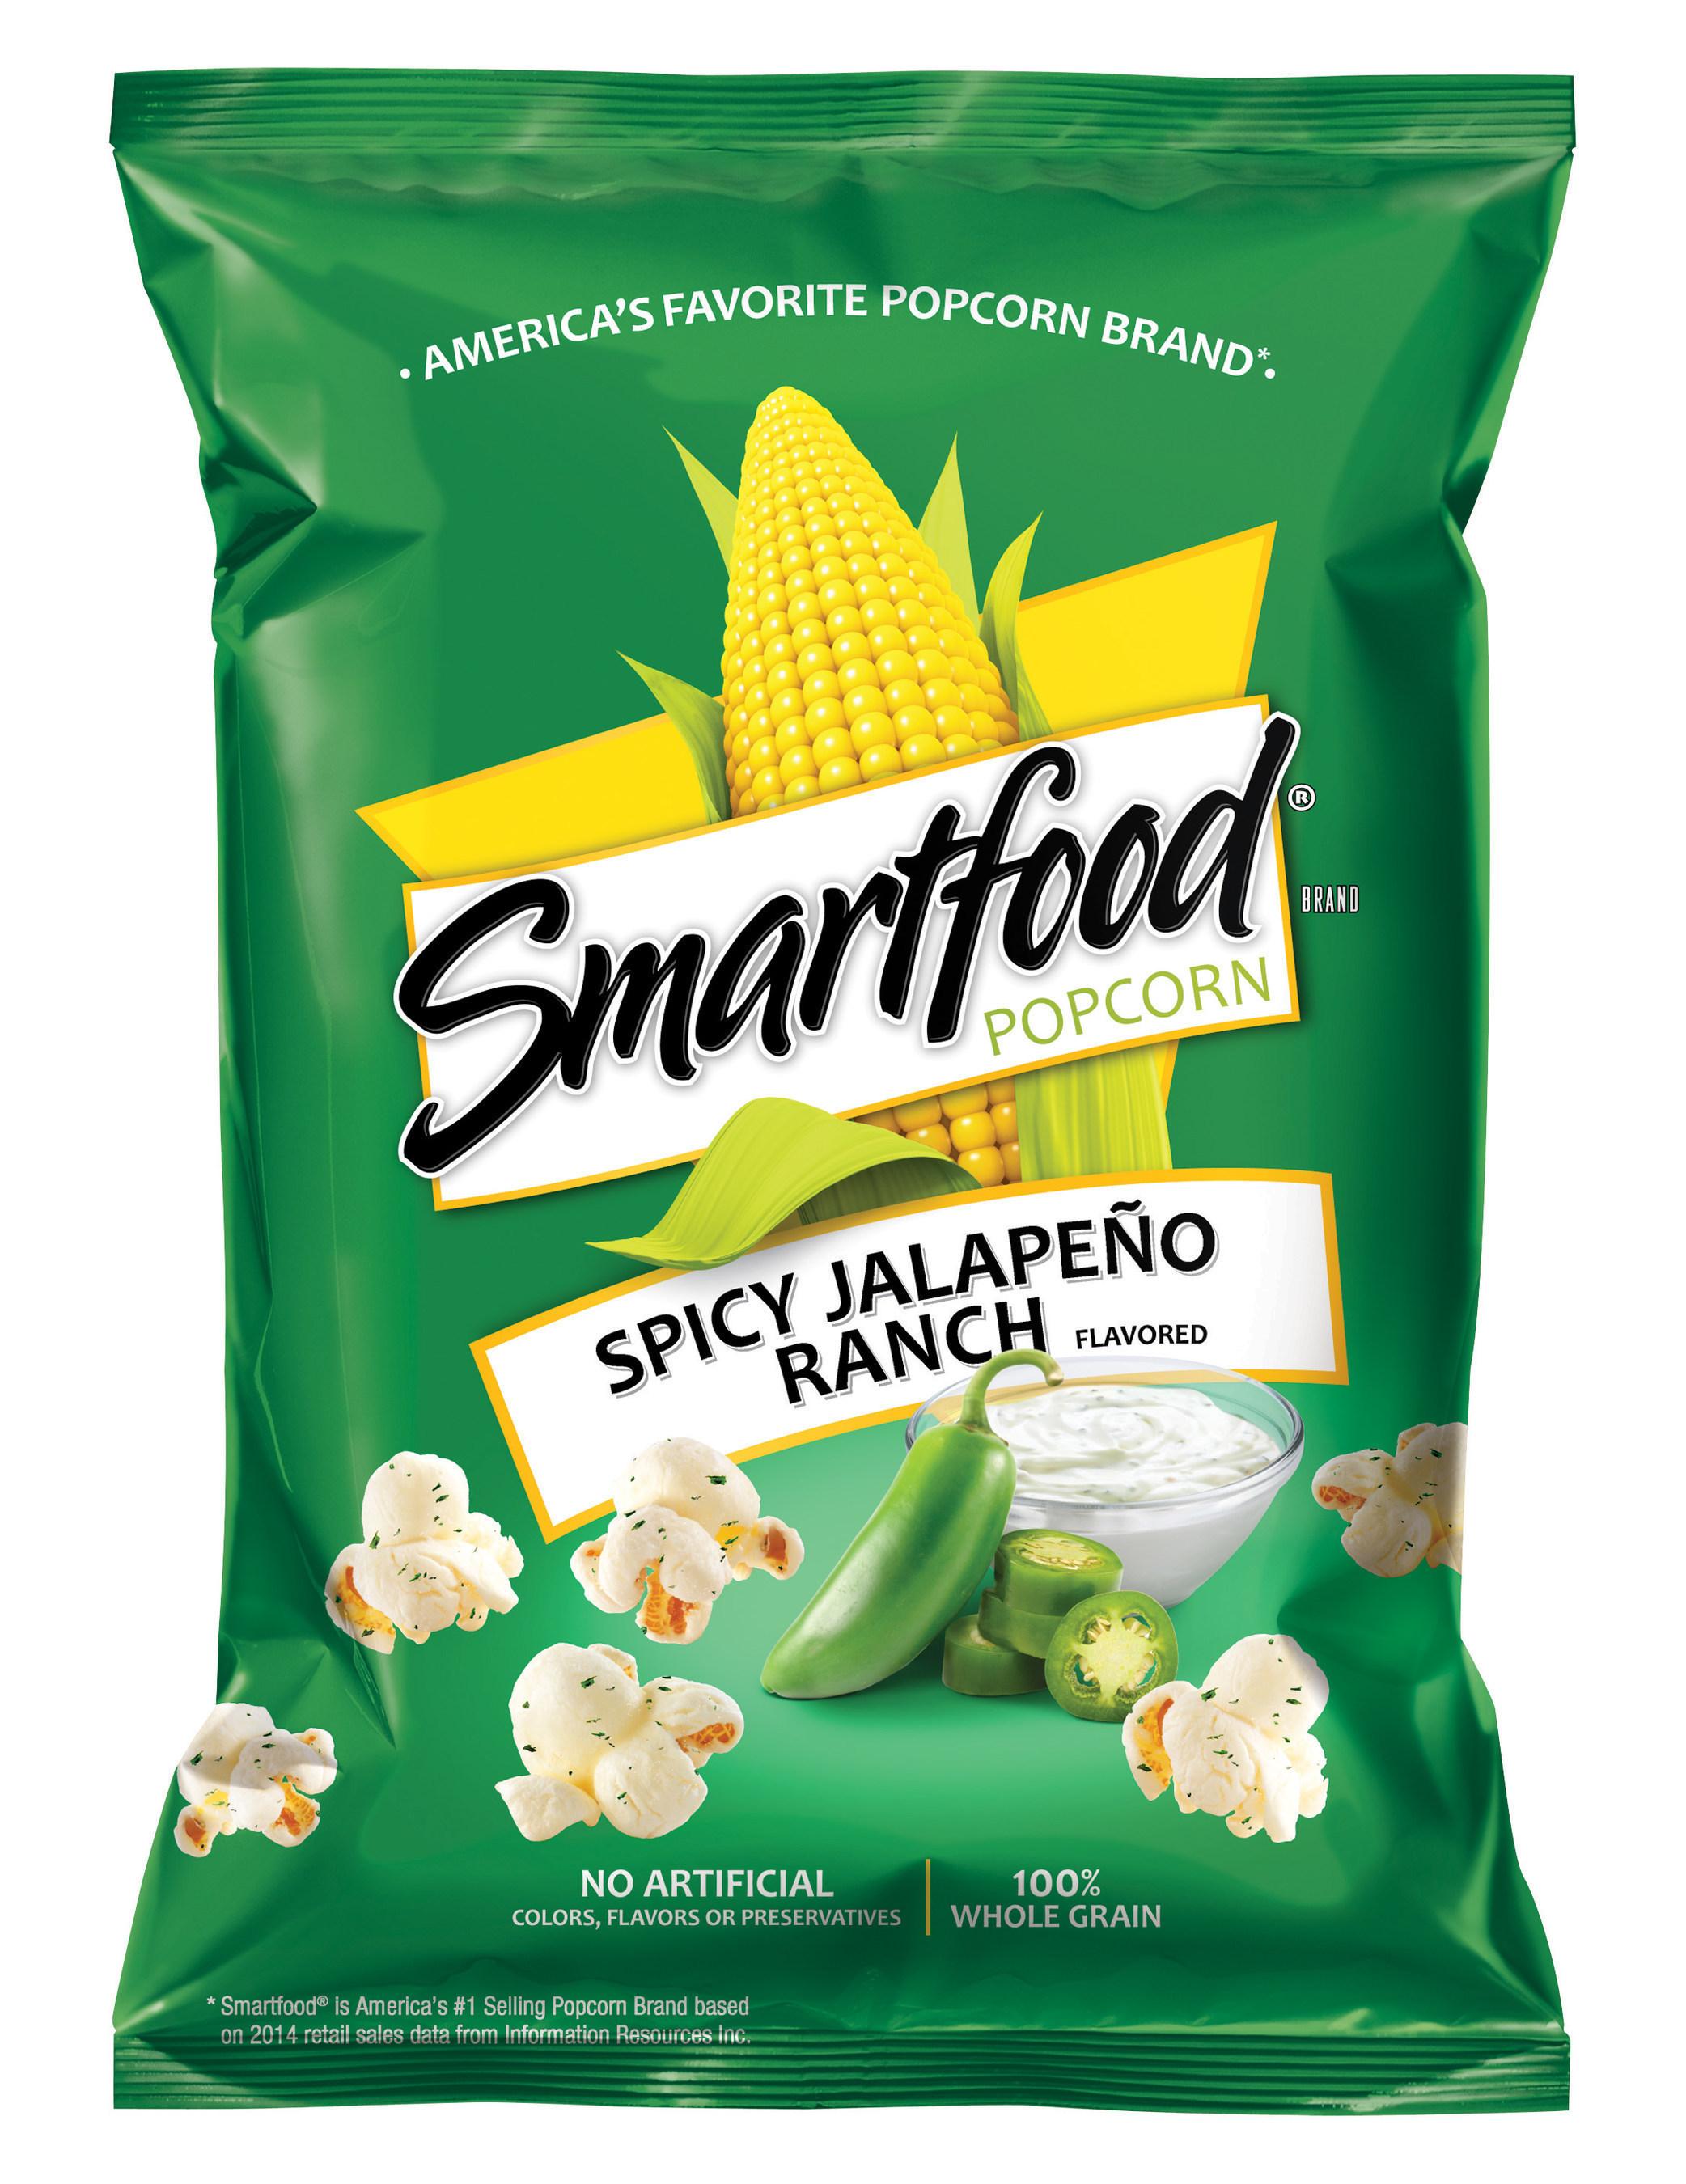 Some Like It Hot Smartfood Debuts Ultimate Popcorn Flavor For Spice Lovers